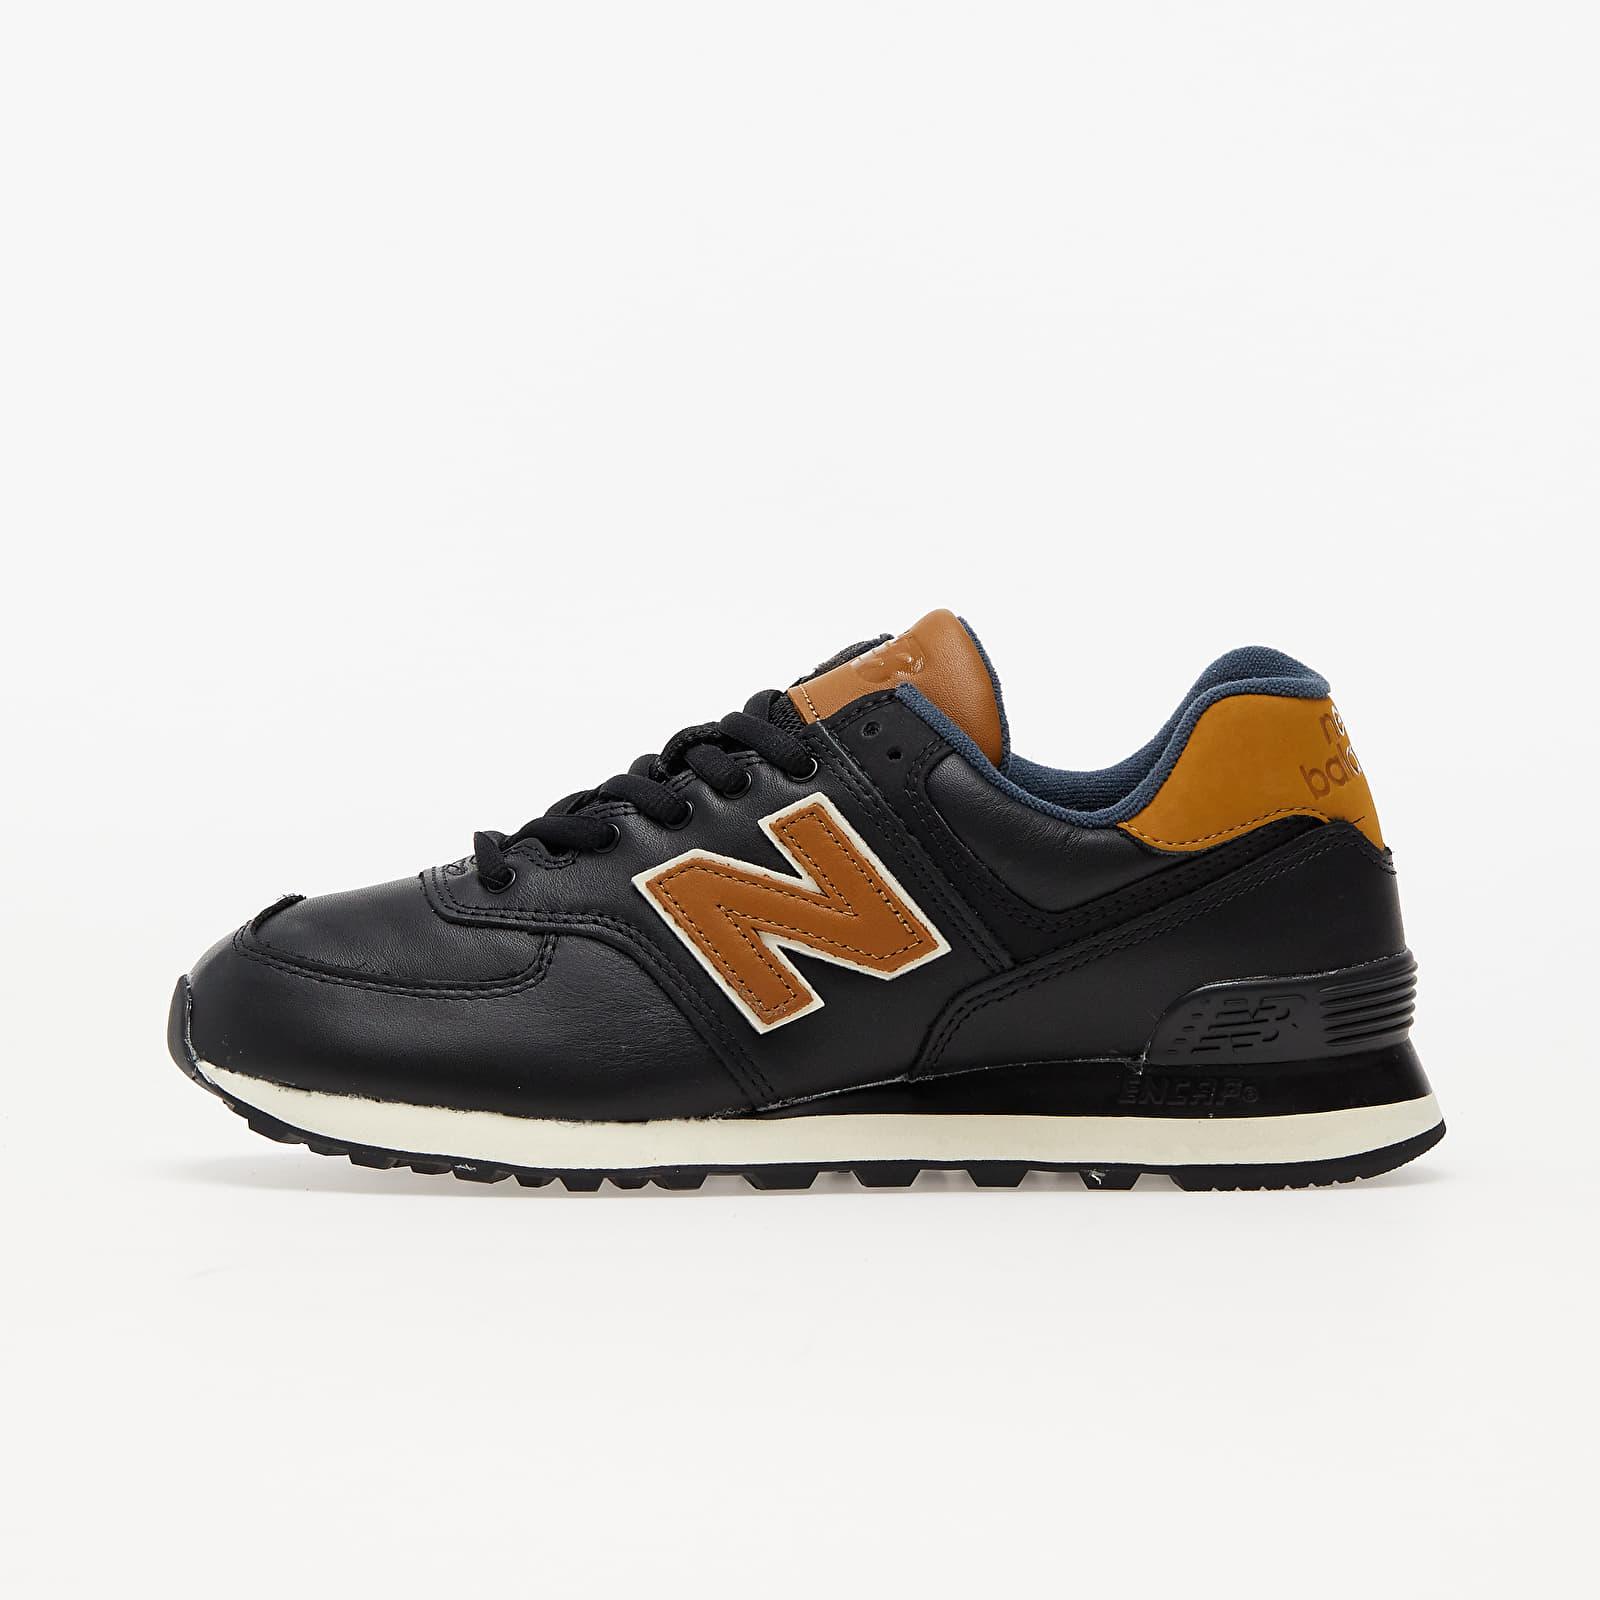 New Balance 574 Natural indigo/ Workwear EUR 44